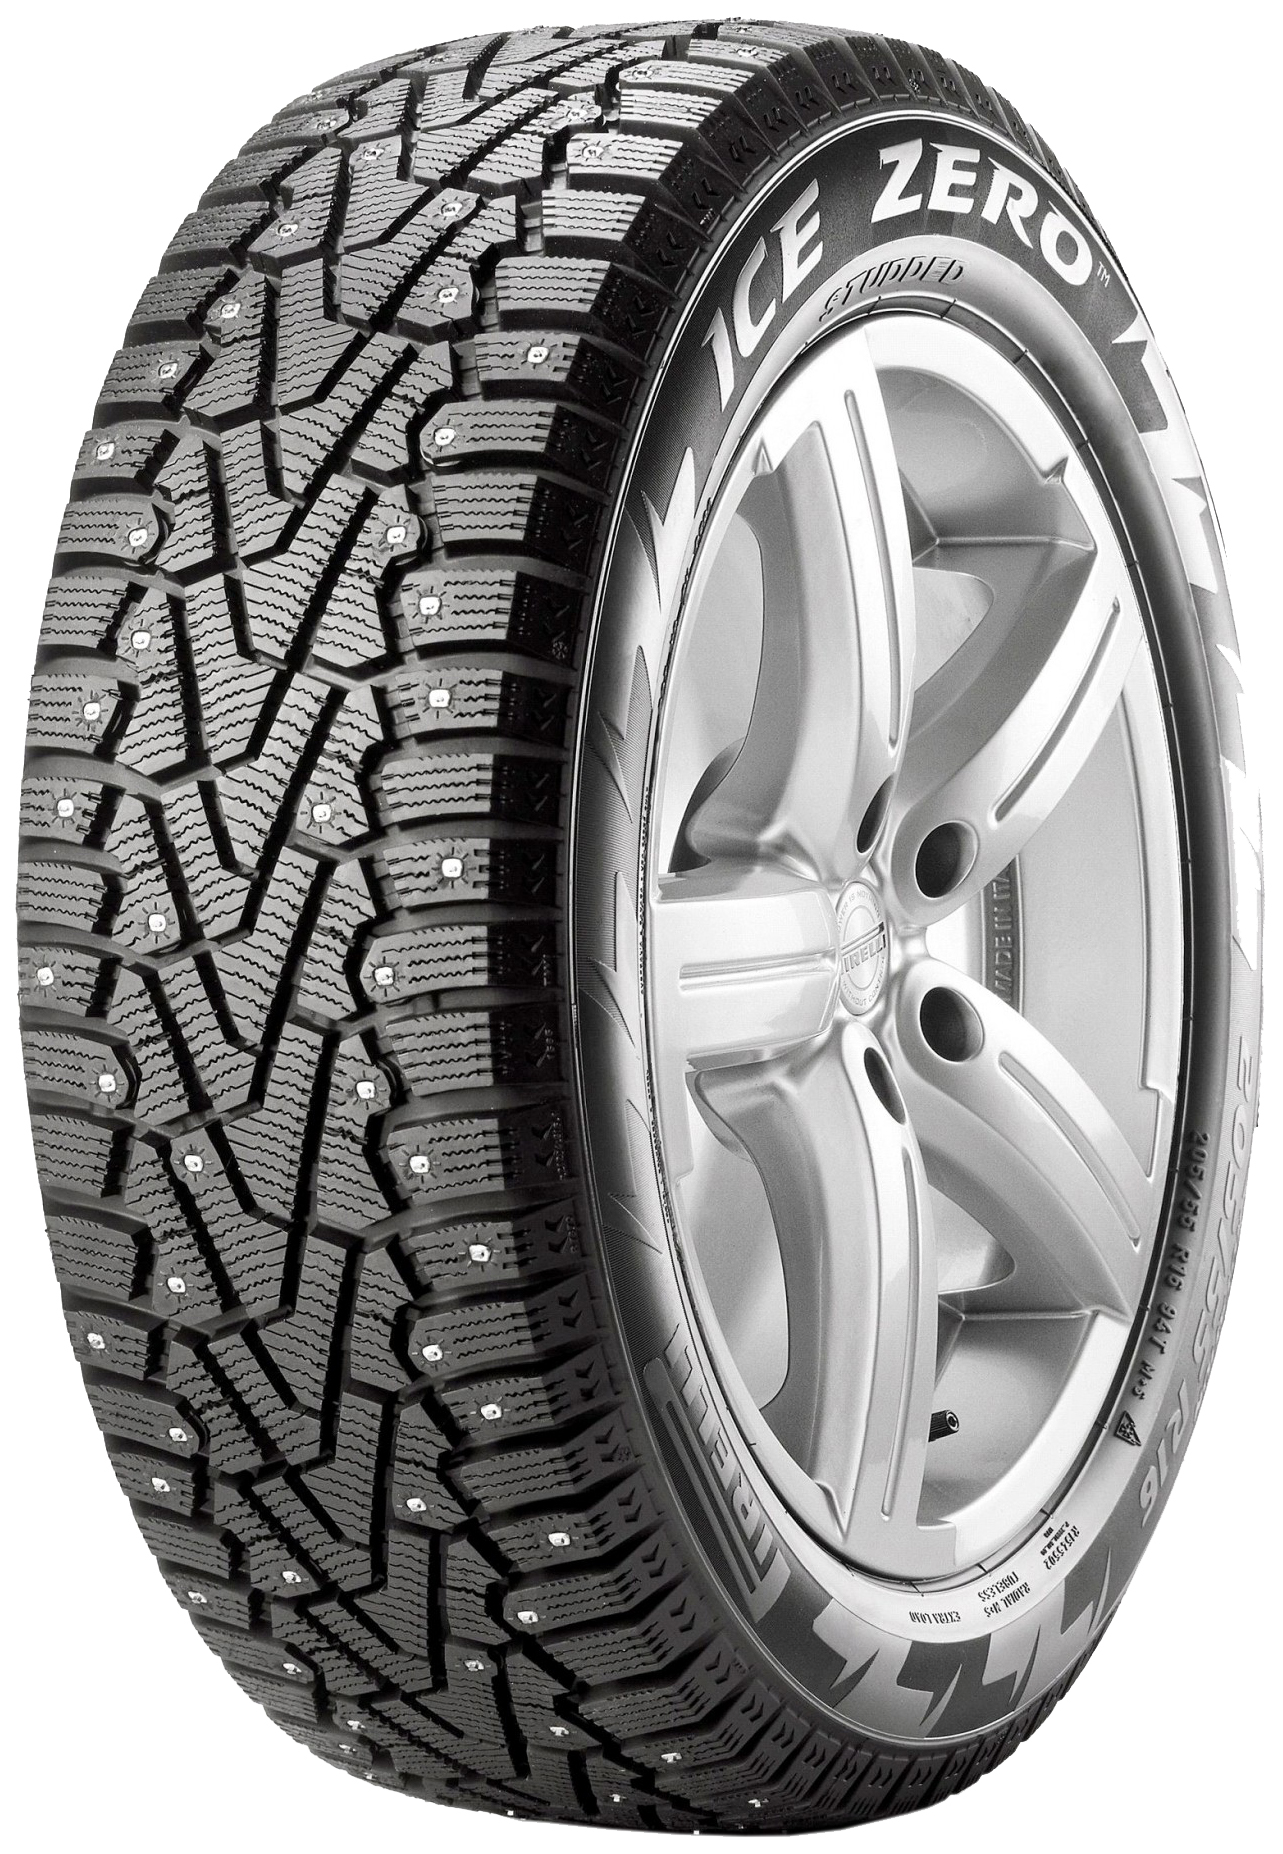 Шины Pirelli Winter Ice Zero 225/60 R18 104T XL шипованная